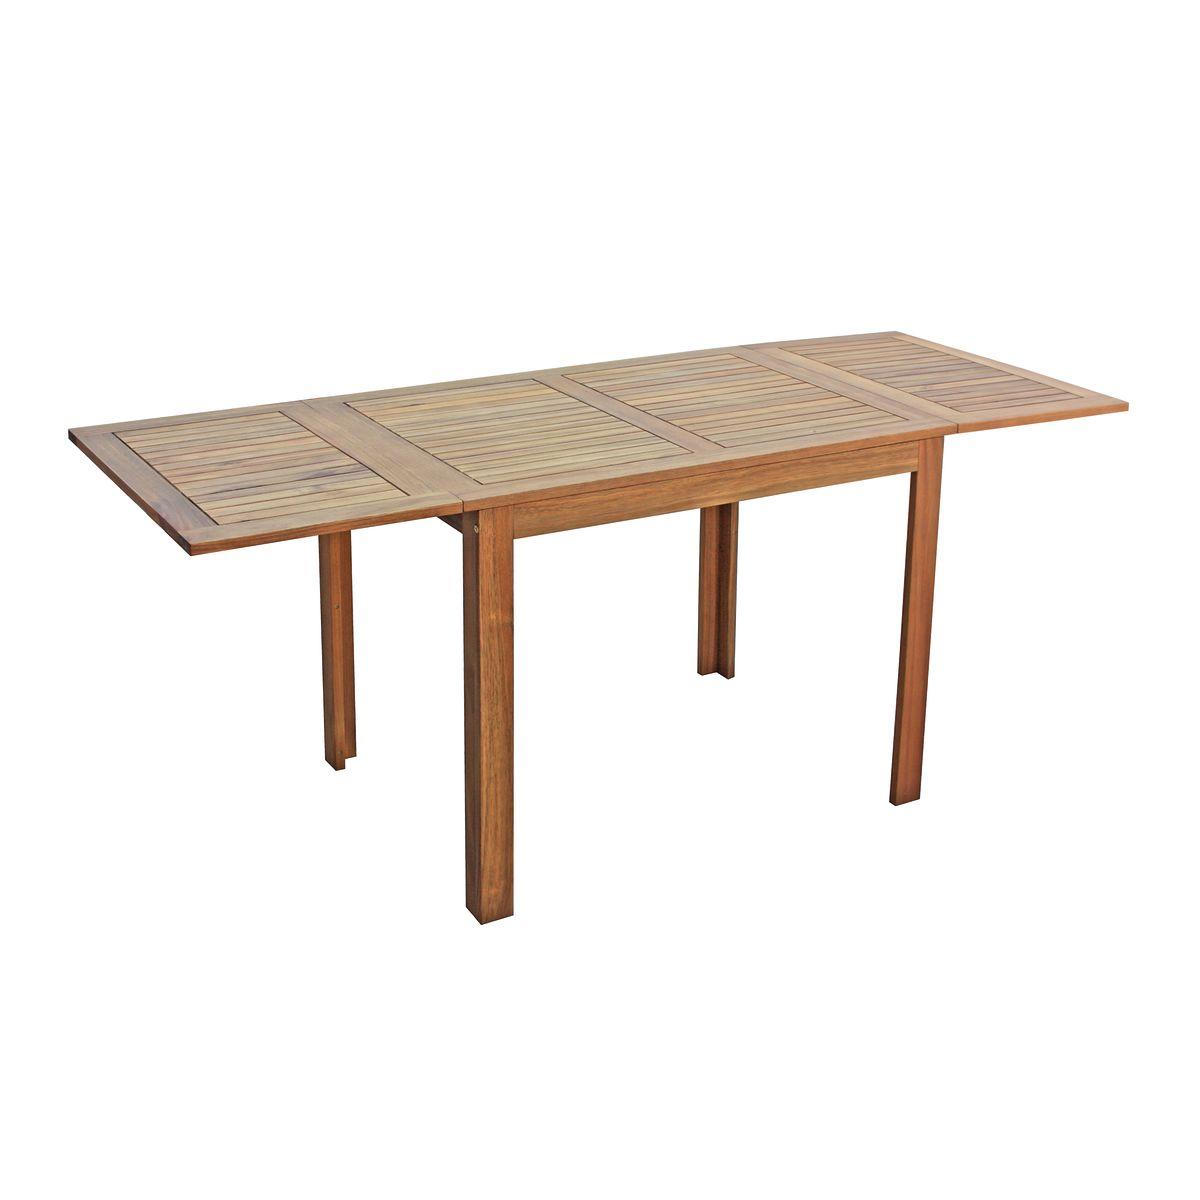 Ikea tavoli giardino allungabili for Tavoli offerte online